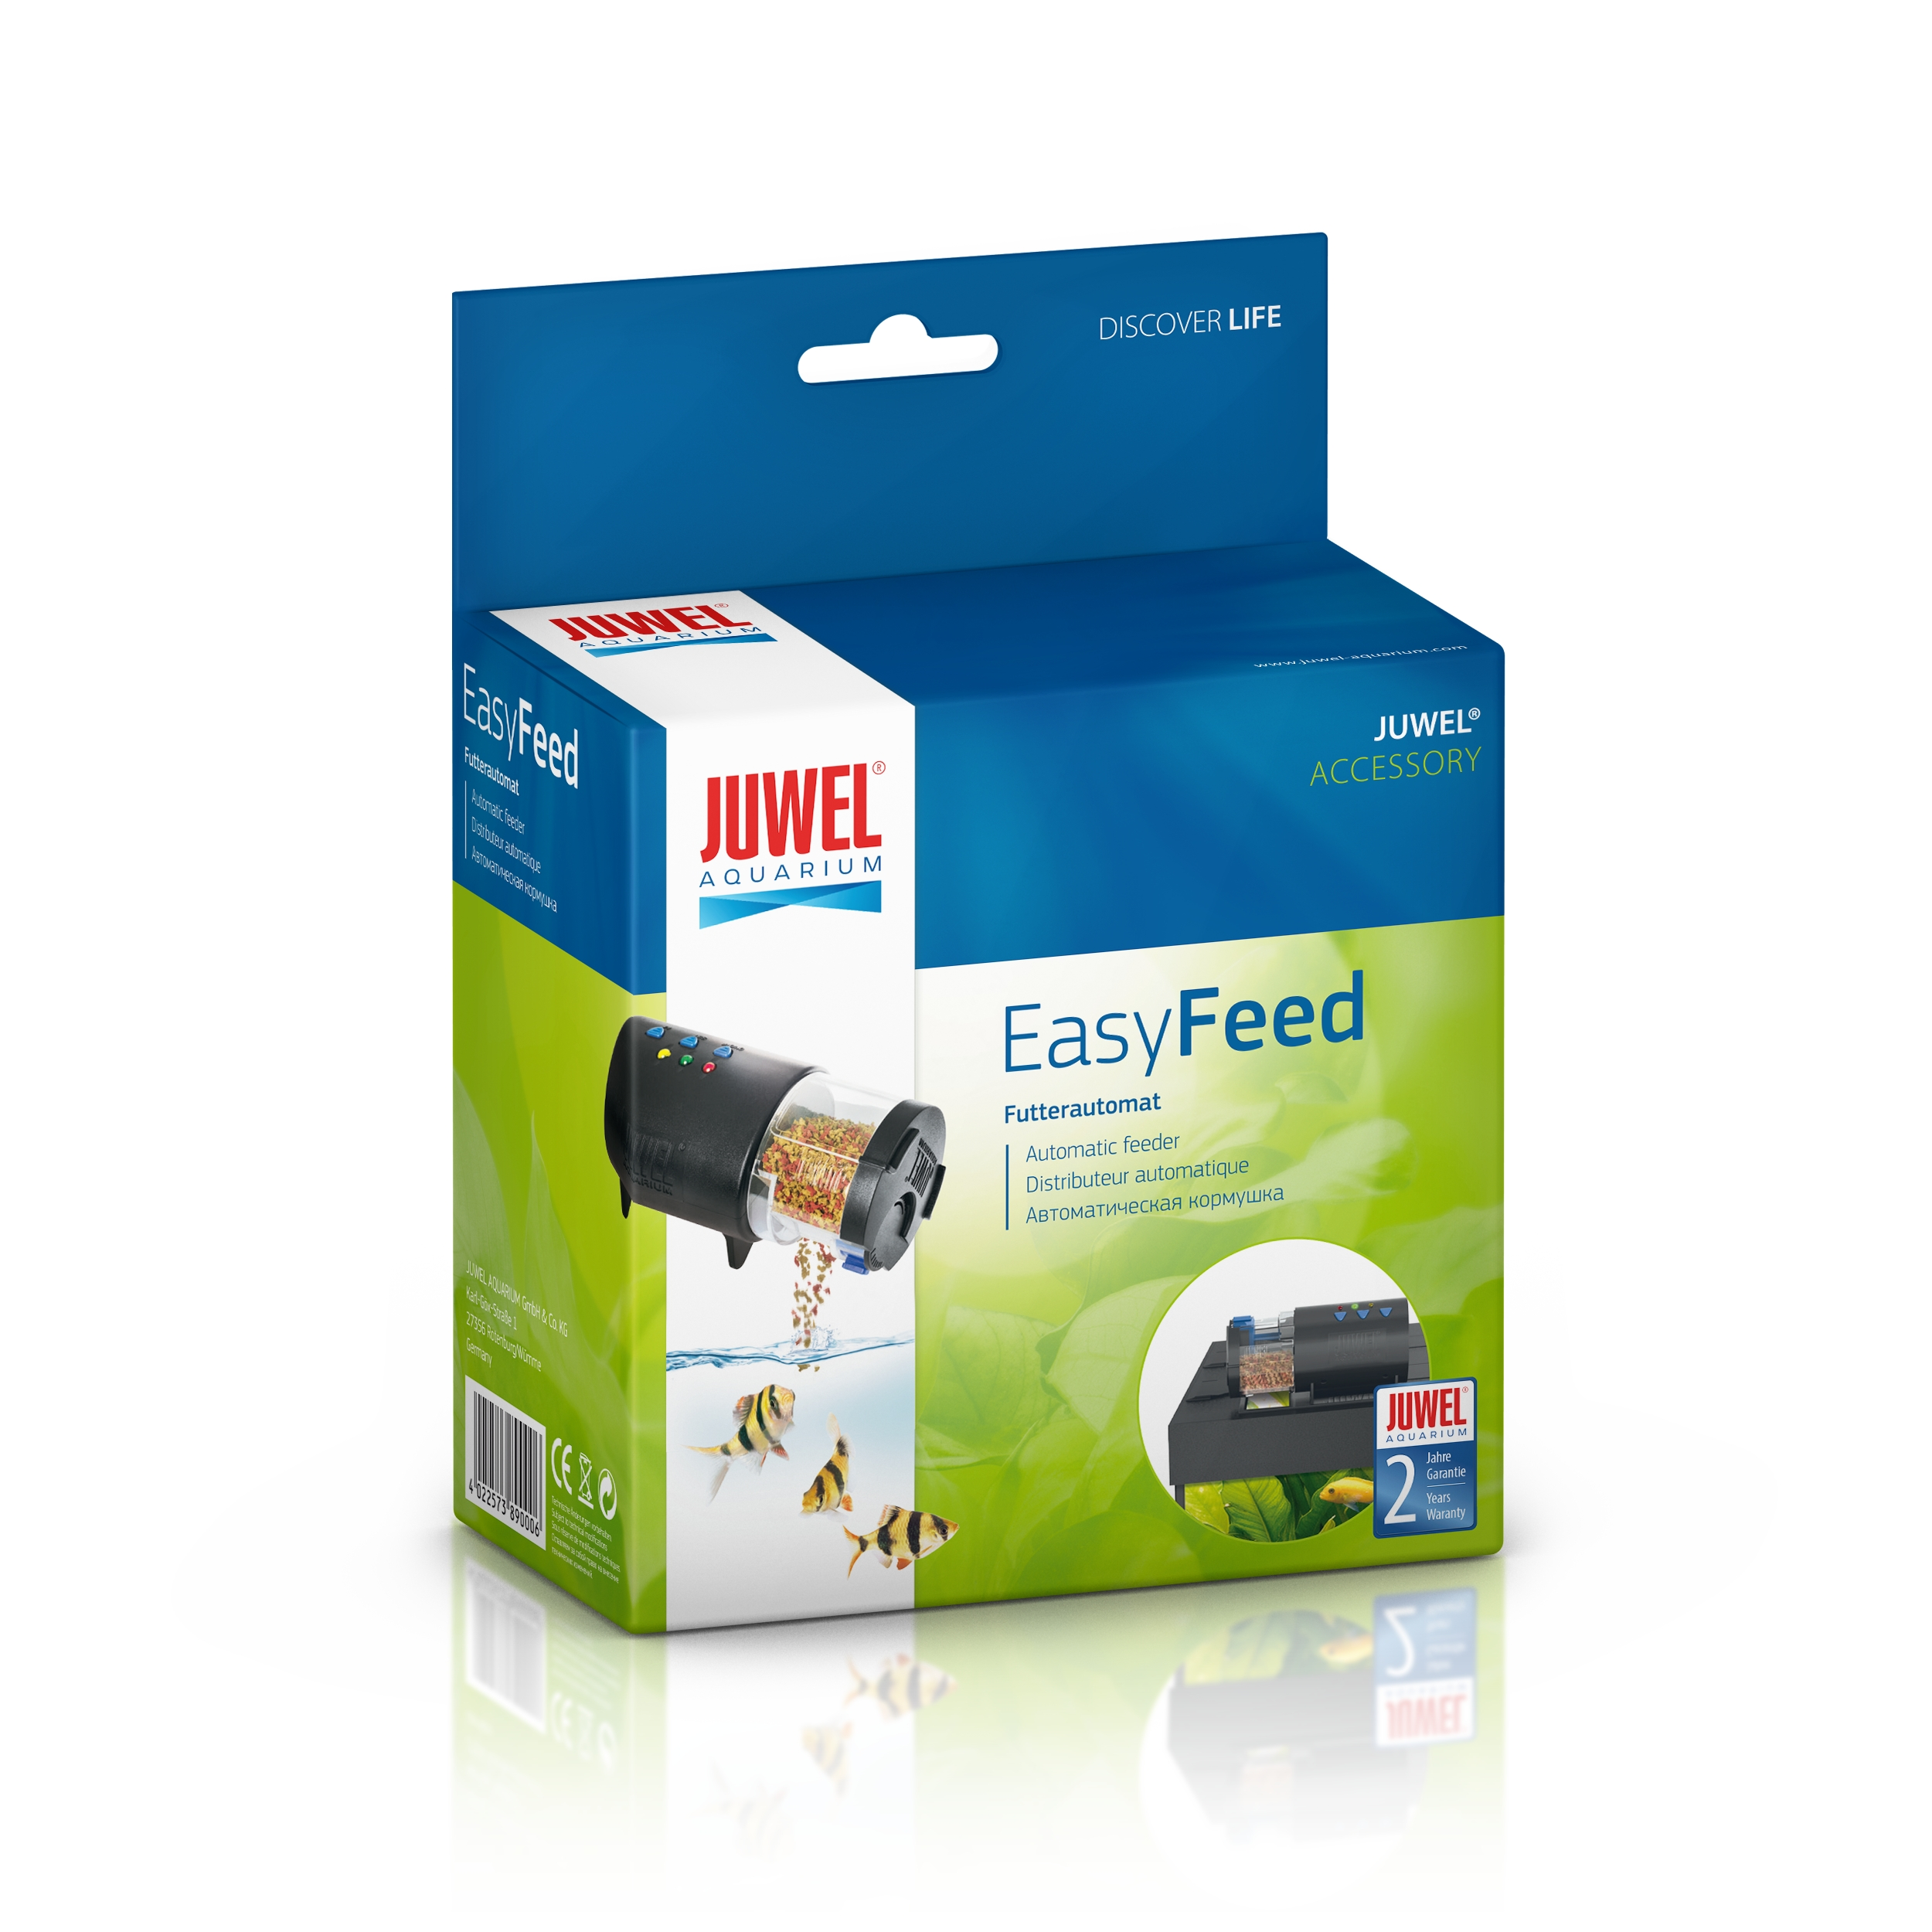 Fischfutterautomat Juwel EasyFeed Image